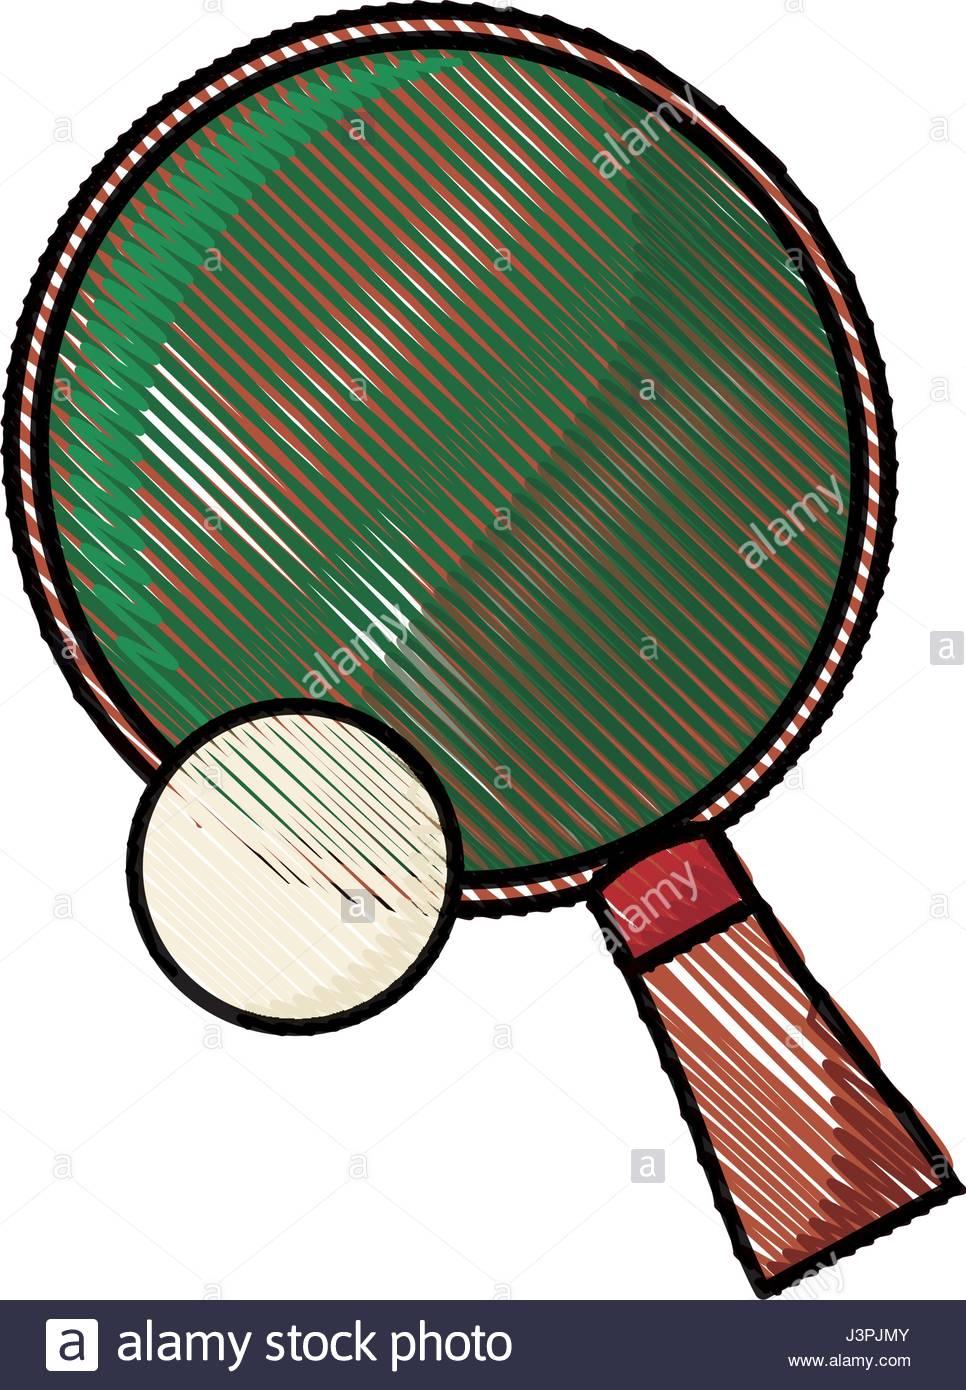 966x1390 Drawing Racket And Ball Ping Pong Play Stock Vector Art